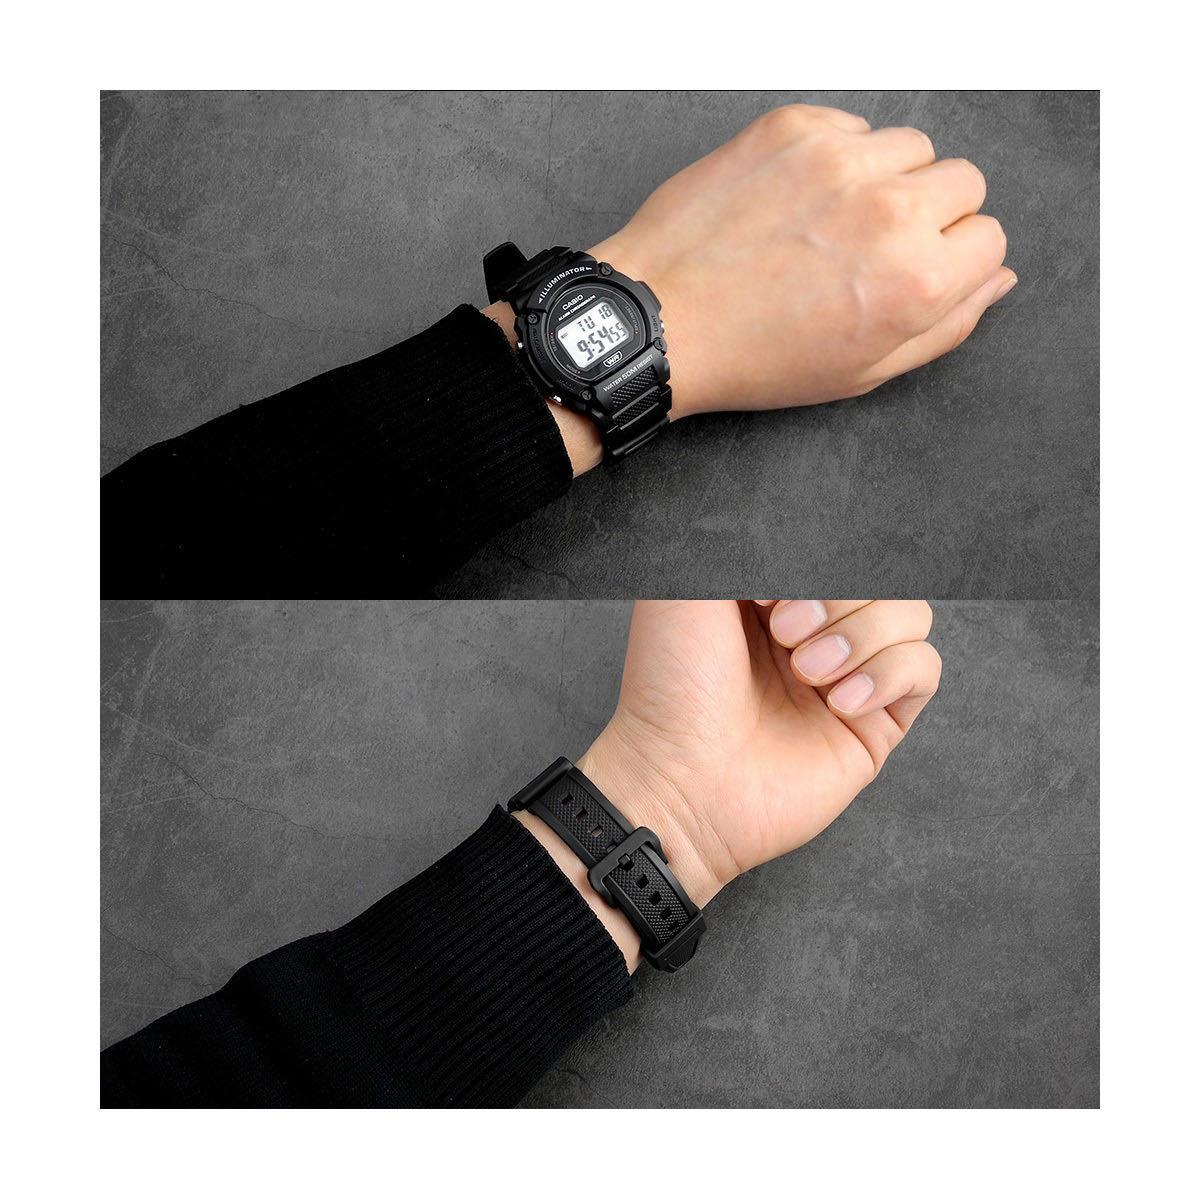 CASIO カシオ 防水 ユニセックス デジタル W219-1A ブラック シンプル メンズ レディース キッズ チープカシオ 男性 女性 子供 腕時計_画像4